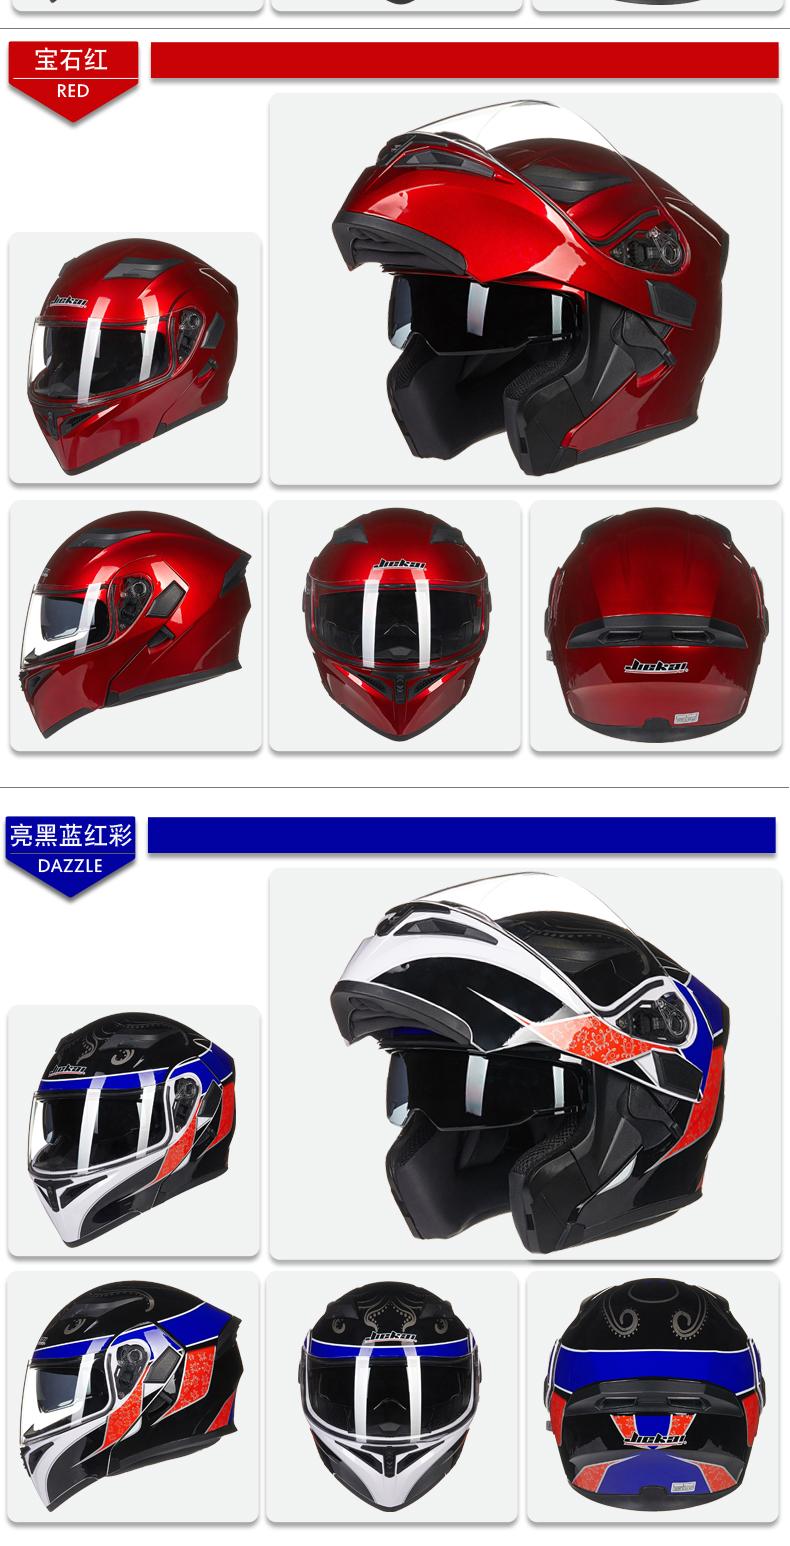 JIEKAI Full Motorcycle Helmets Double Visor DOT Flip Up Racing Street Helmet 902